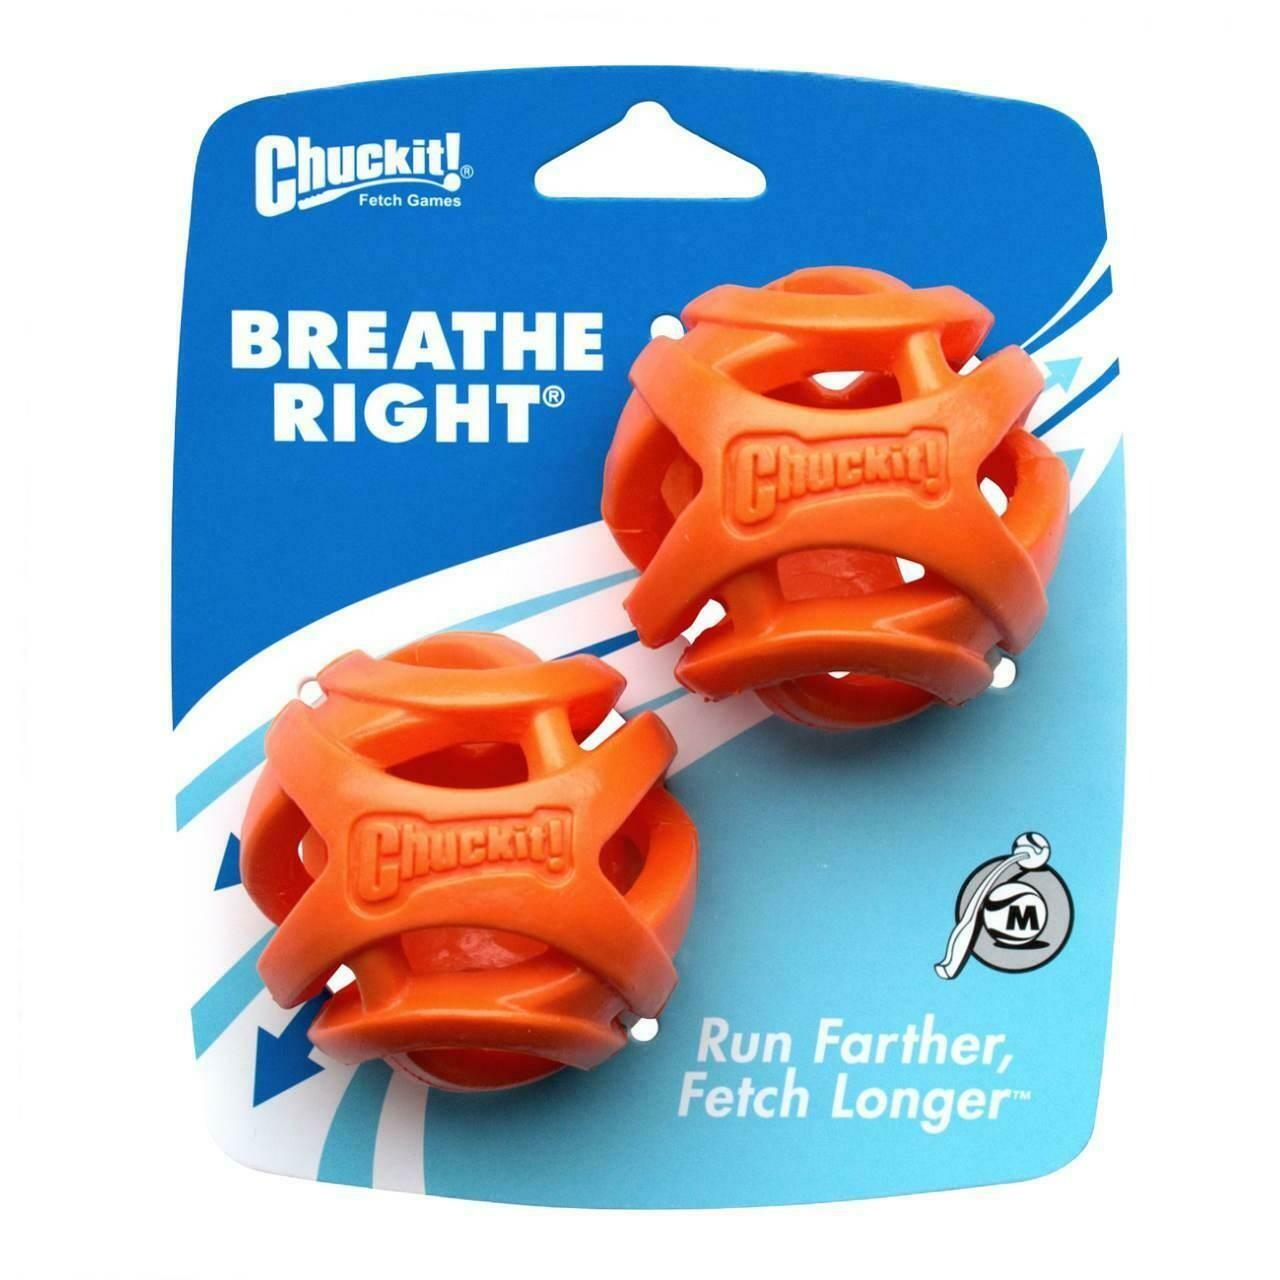 Chuckit Breathe Right Fetch Ball Medium (2Pk)